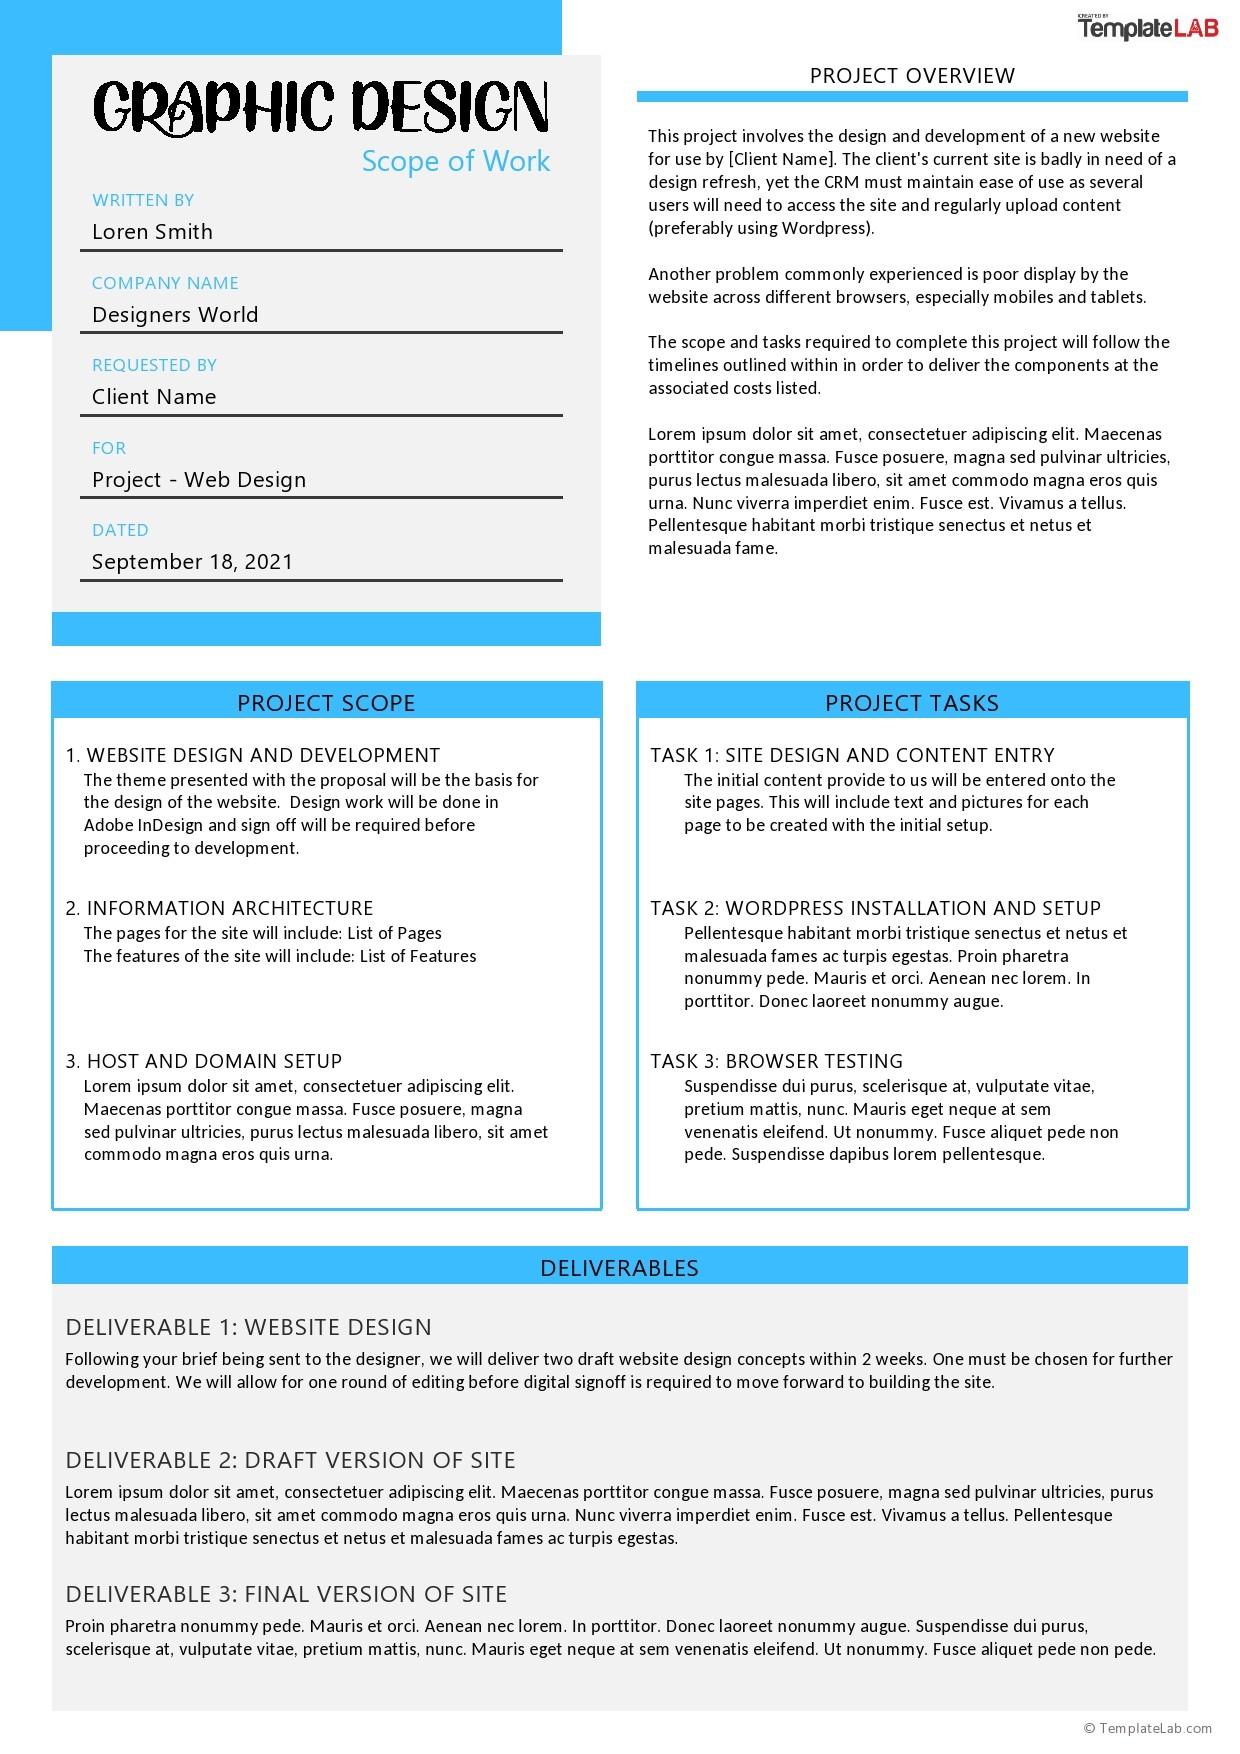 Free Graphic Design Scope of Work Template - TemplateLab.com